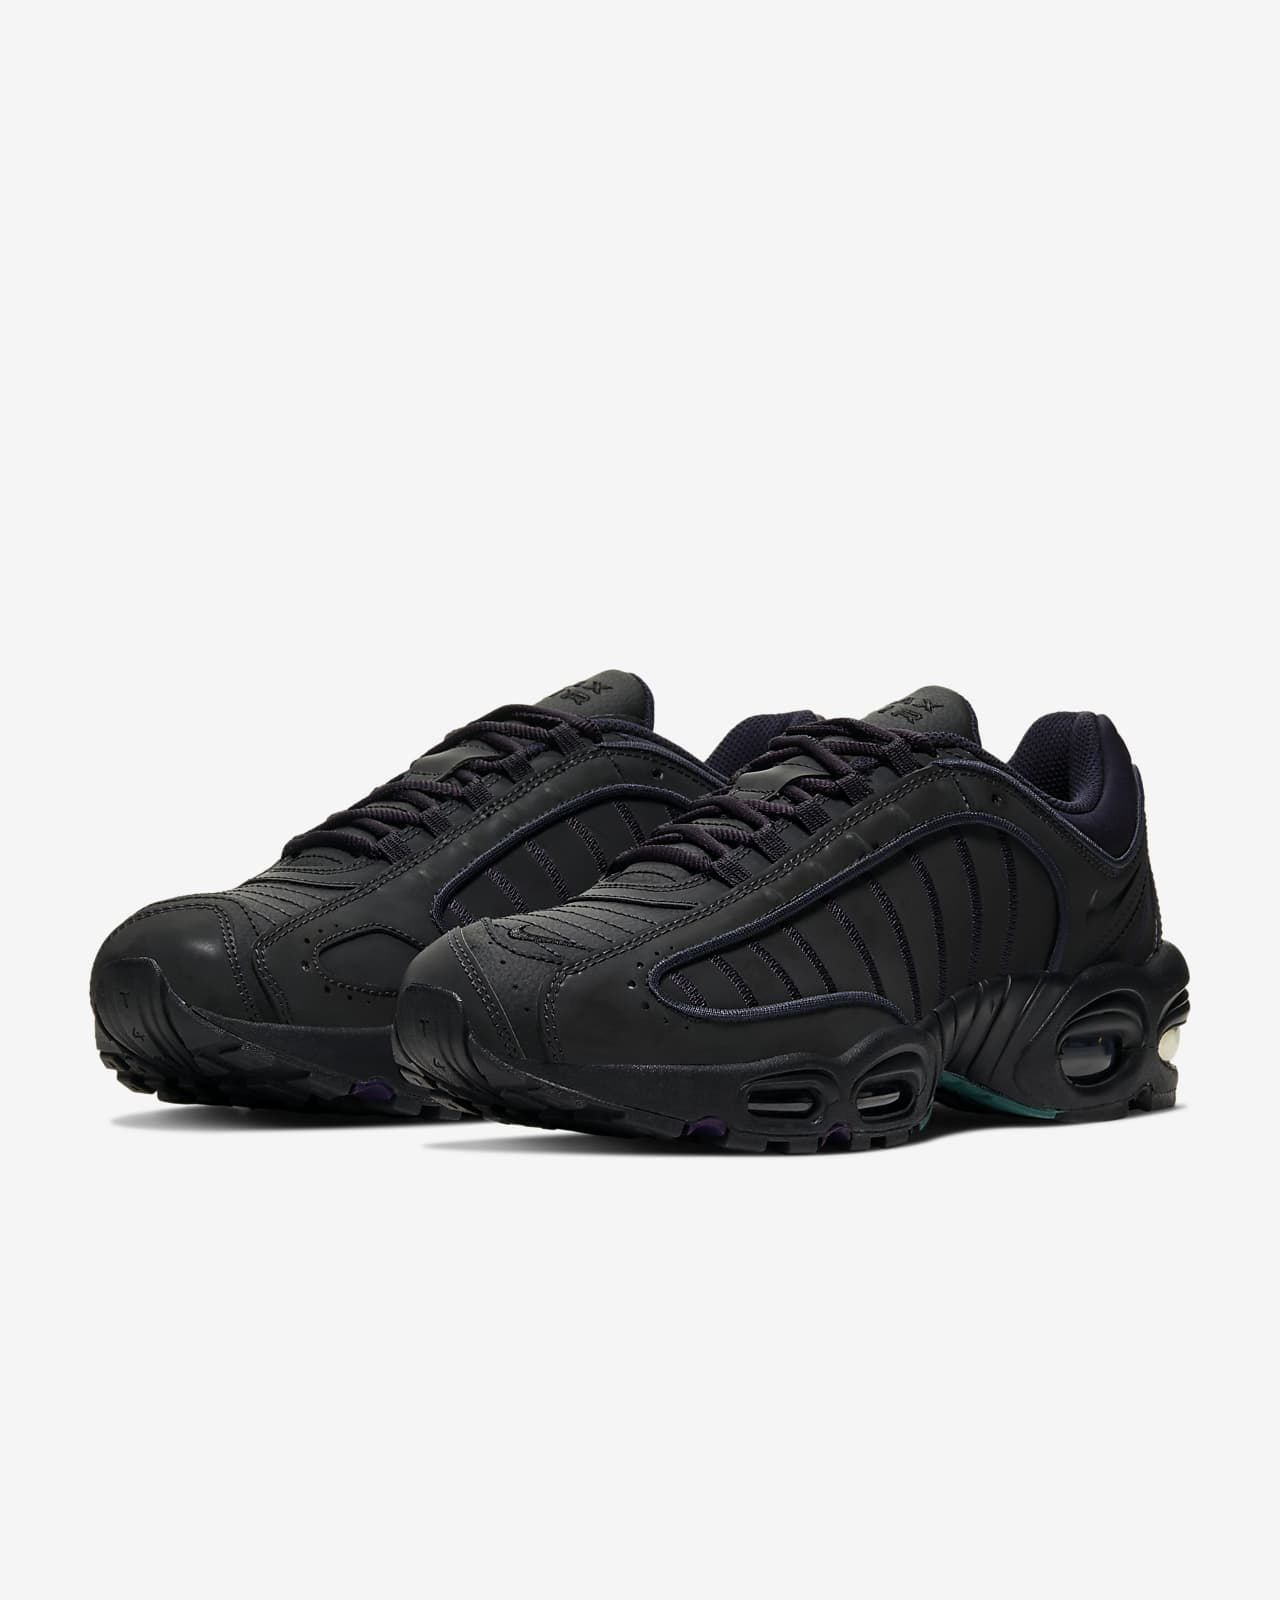 Nike Air Max Tailwind 99 Shoe